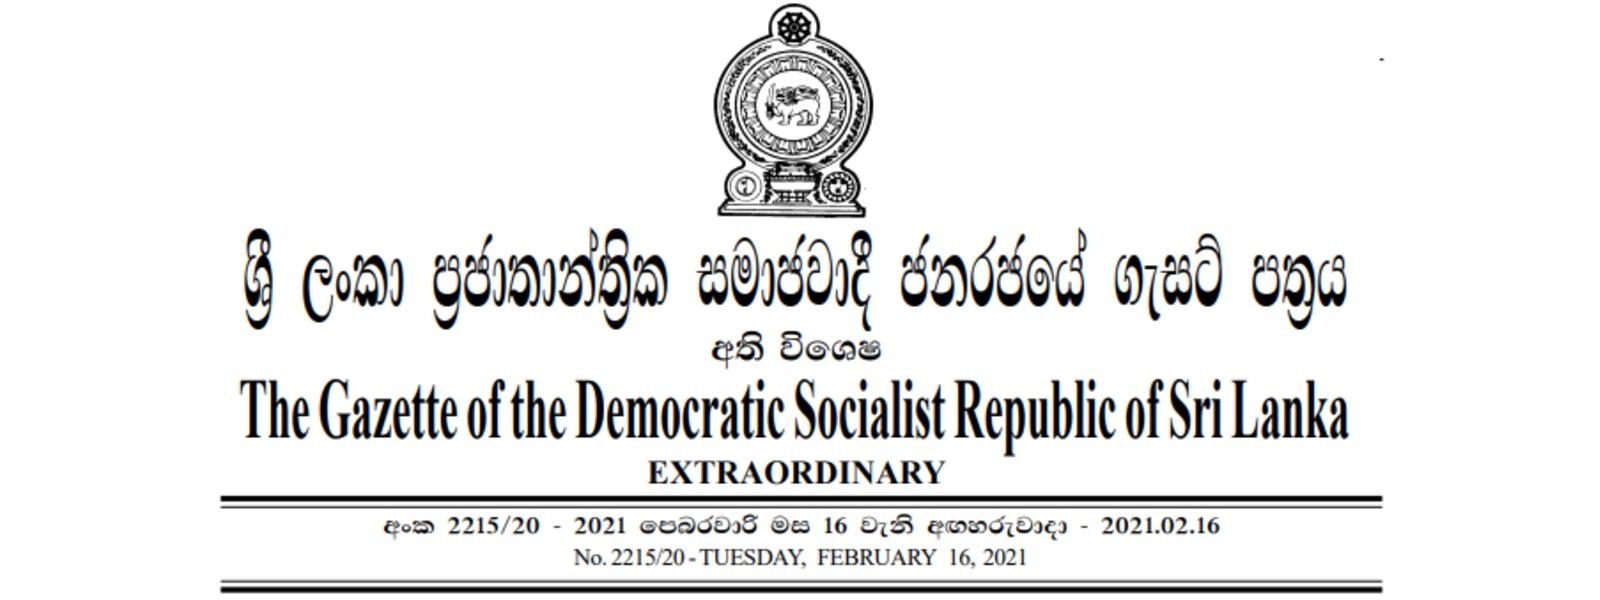 Portfolios of three State Ministries revised via Extra-Gazette